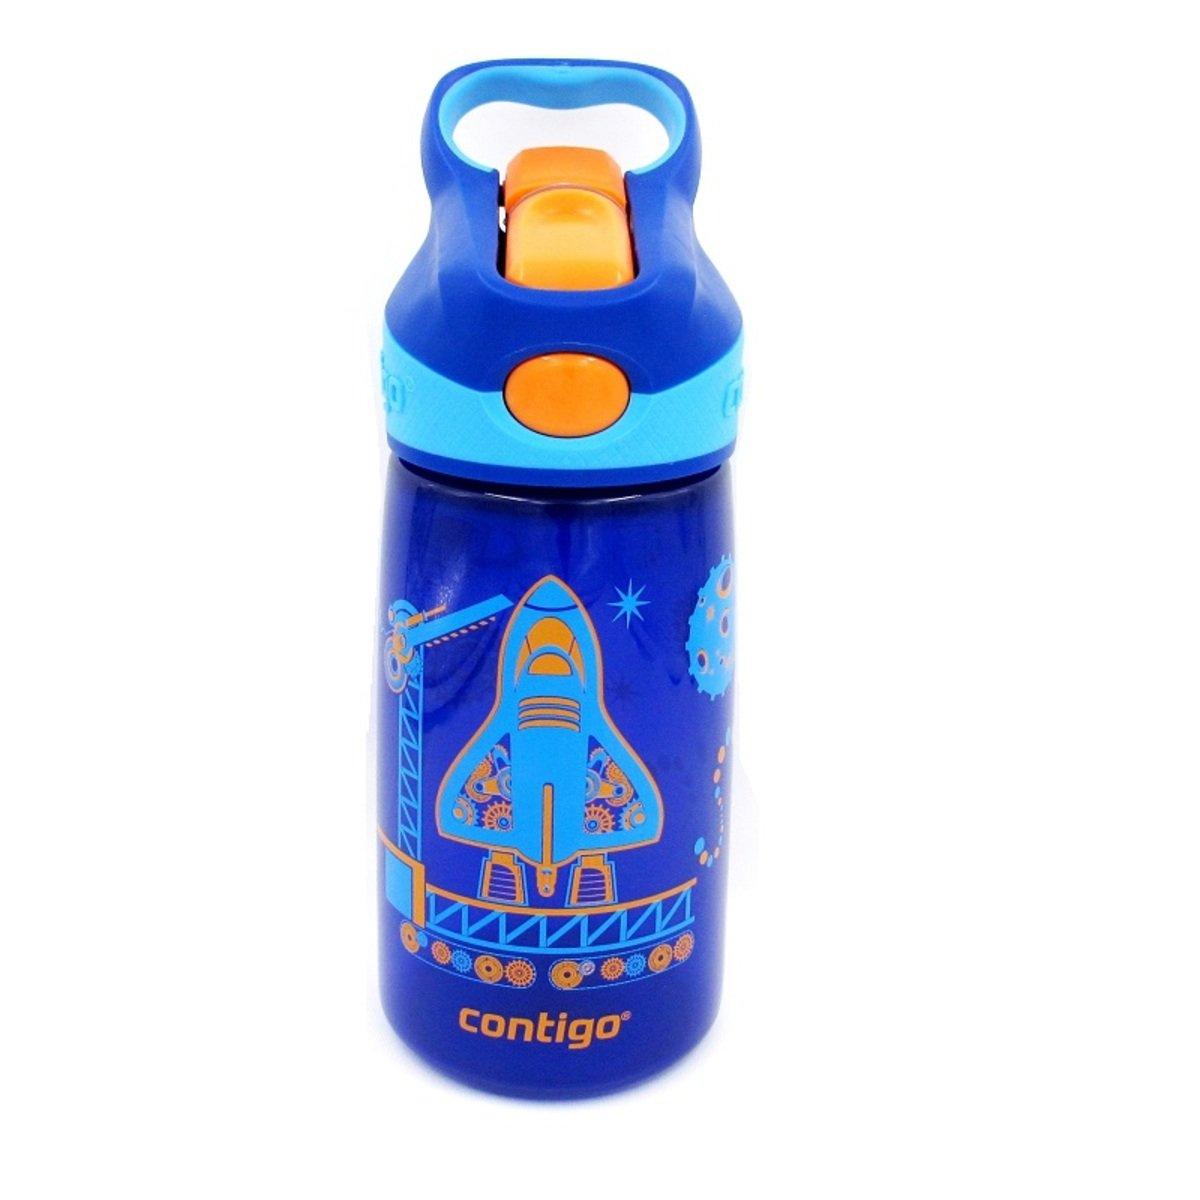 Striker 兒童自動吸管杯 - 升空圖案